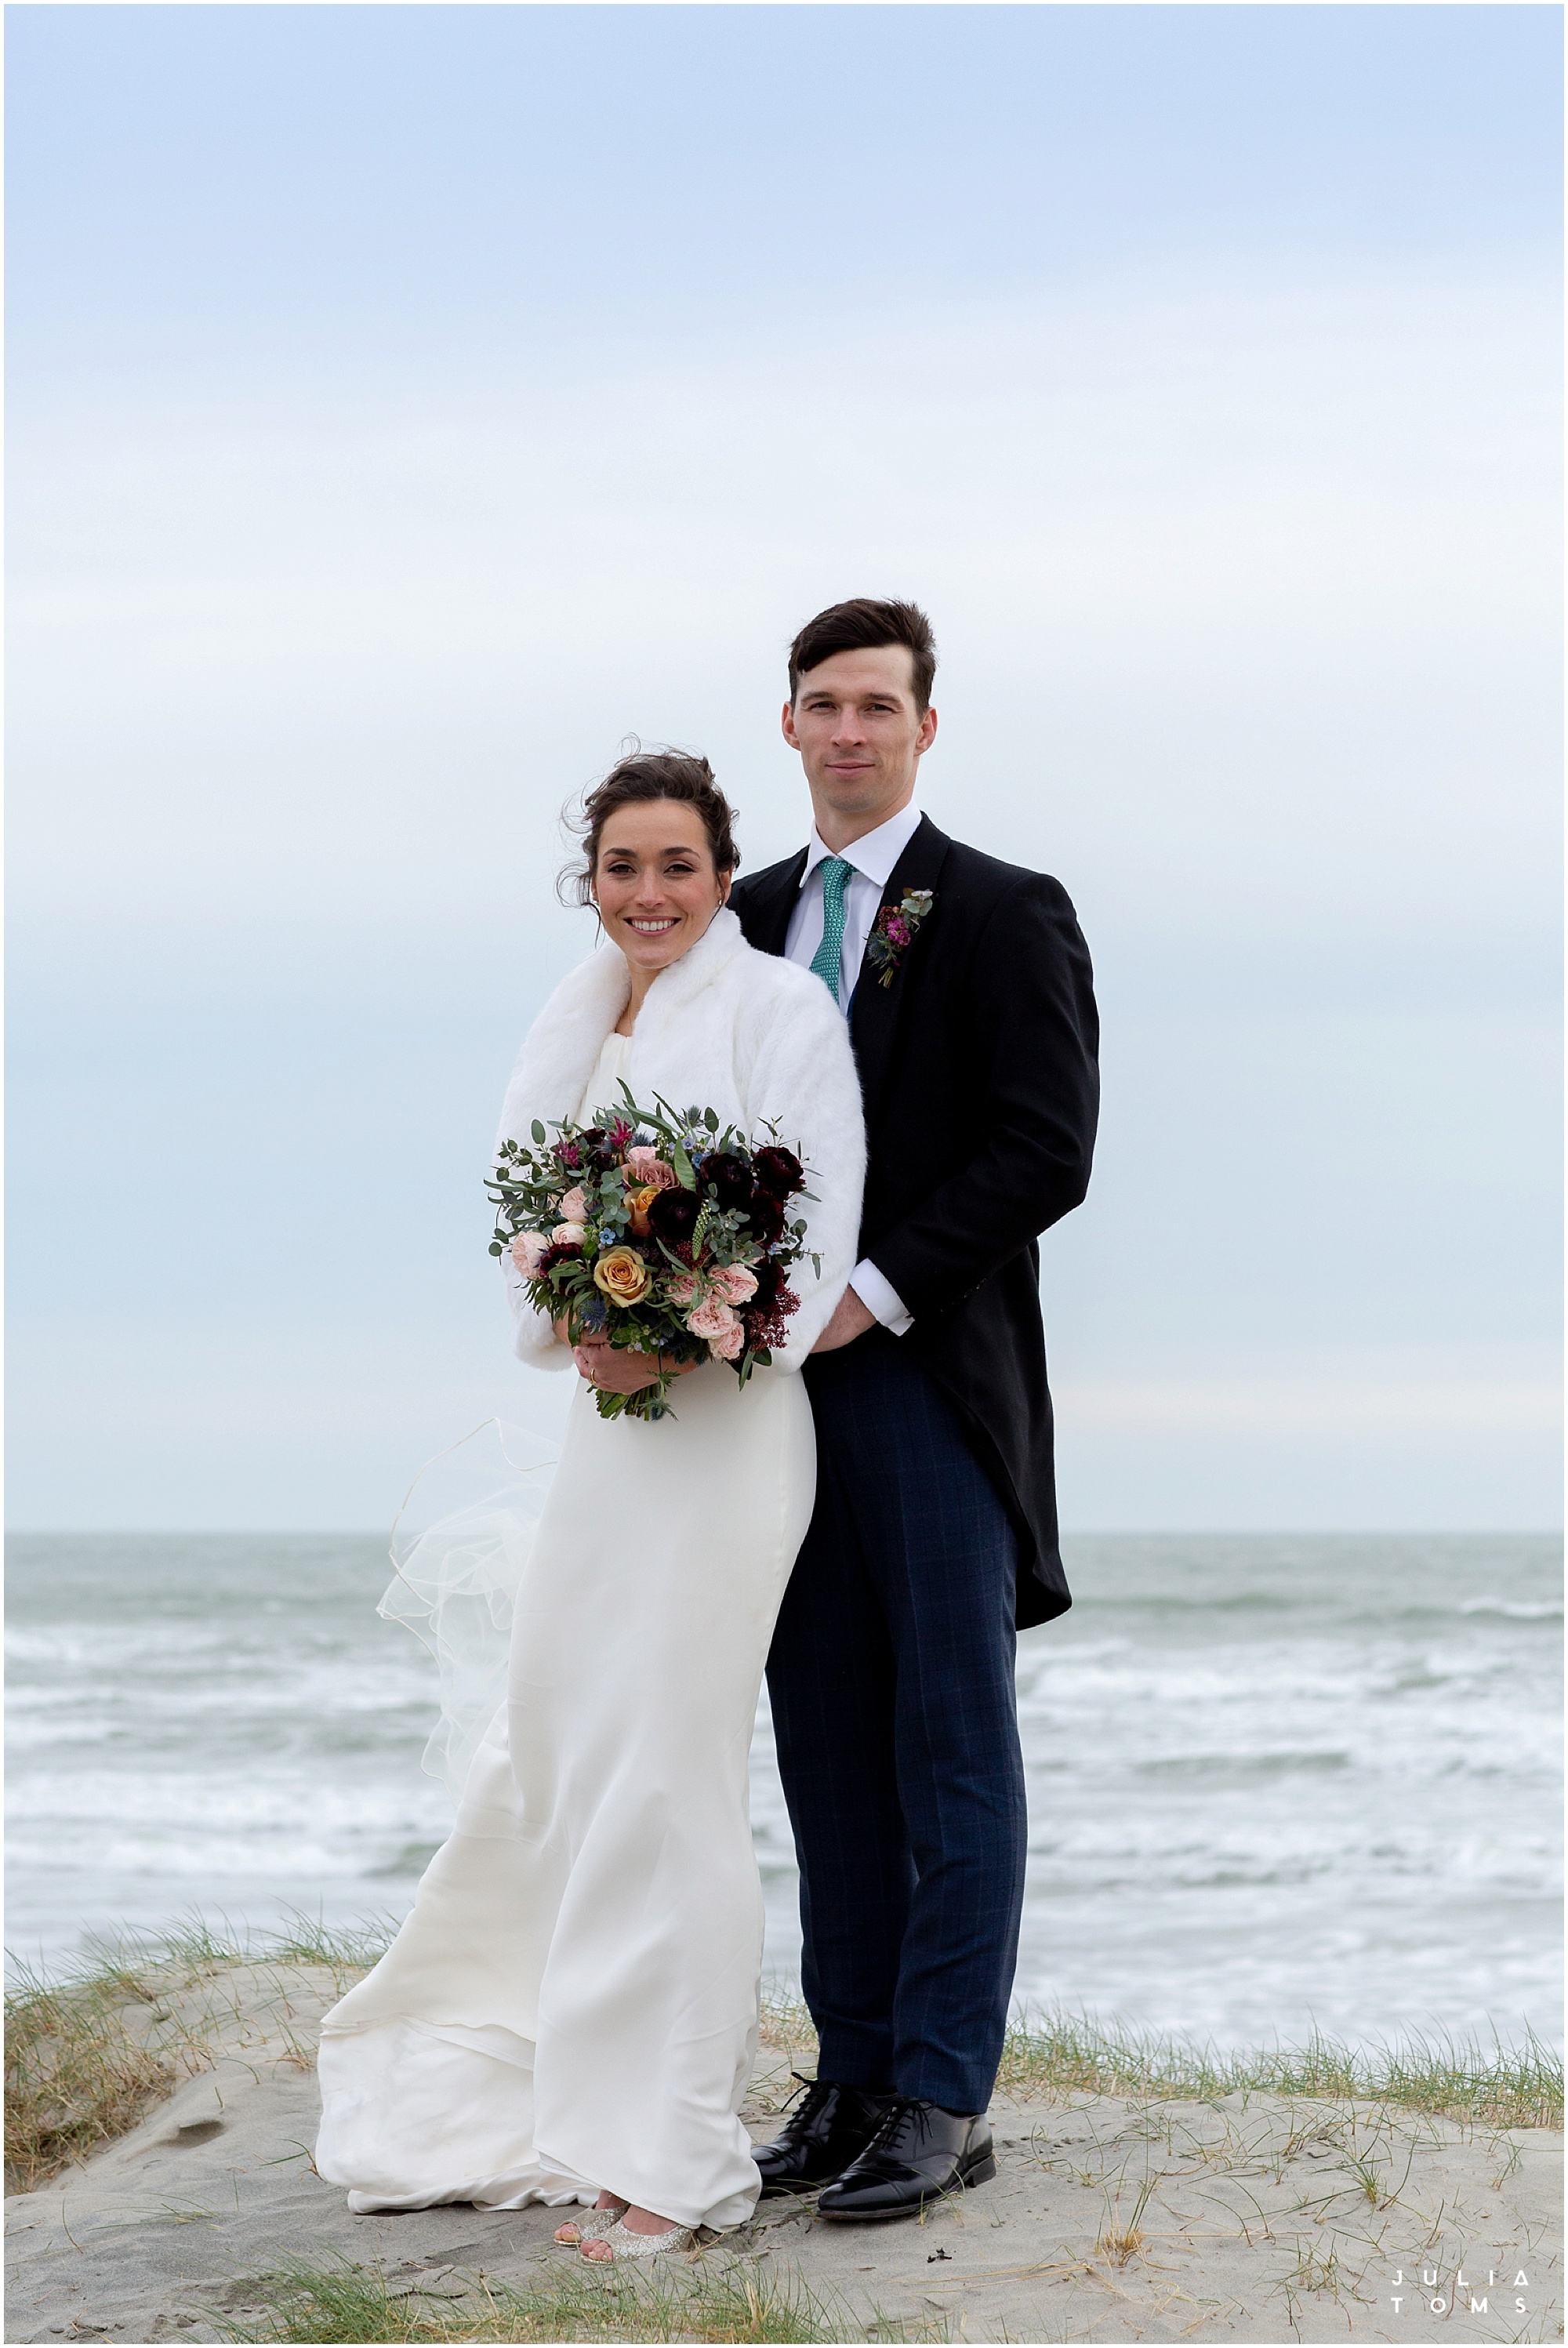 Southend_barn_wedding_photographer_juliatoms_011.jpg